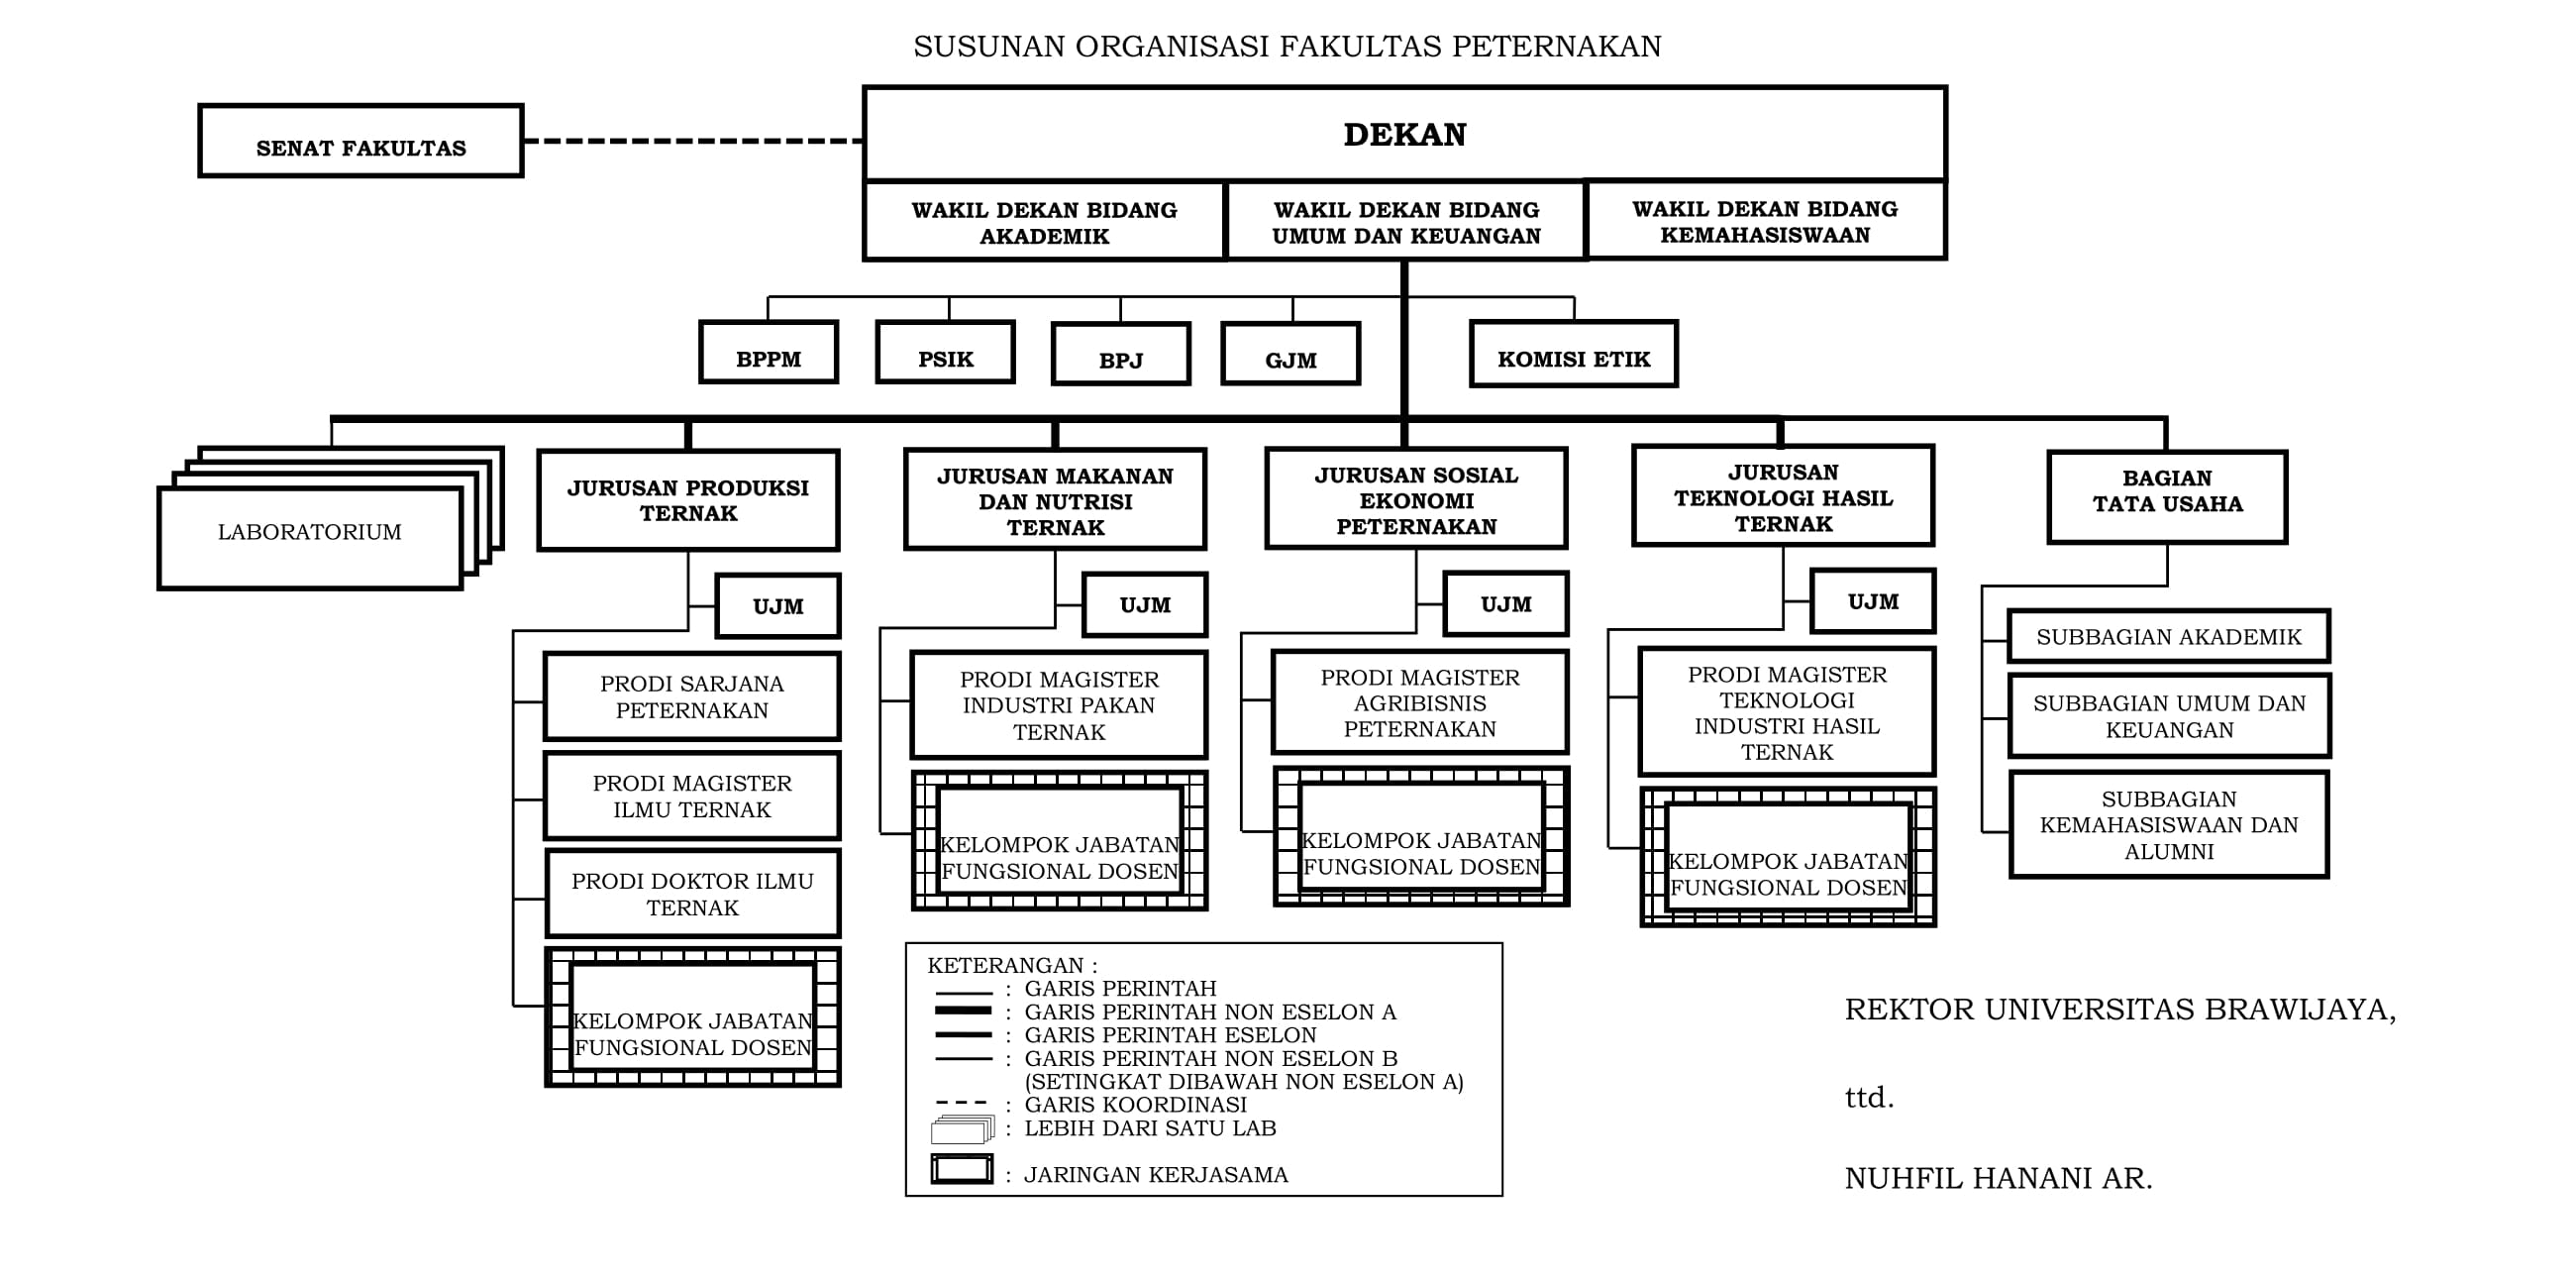 Struktur Organisasi Fakultas Peternakan Universitas Brawijaya